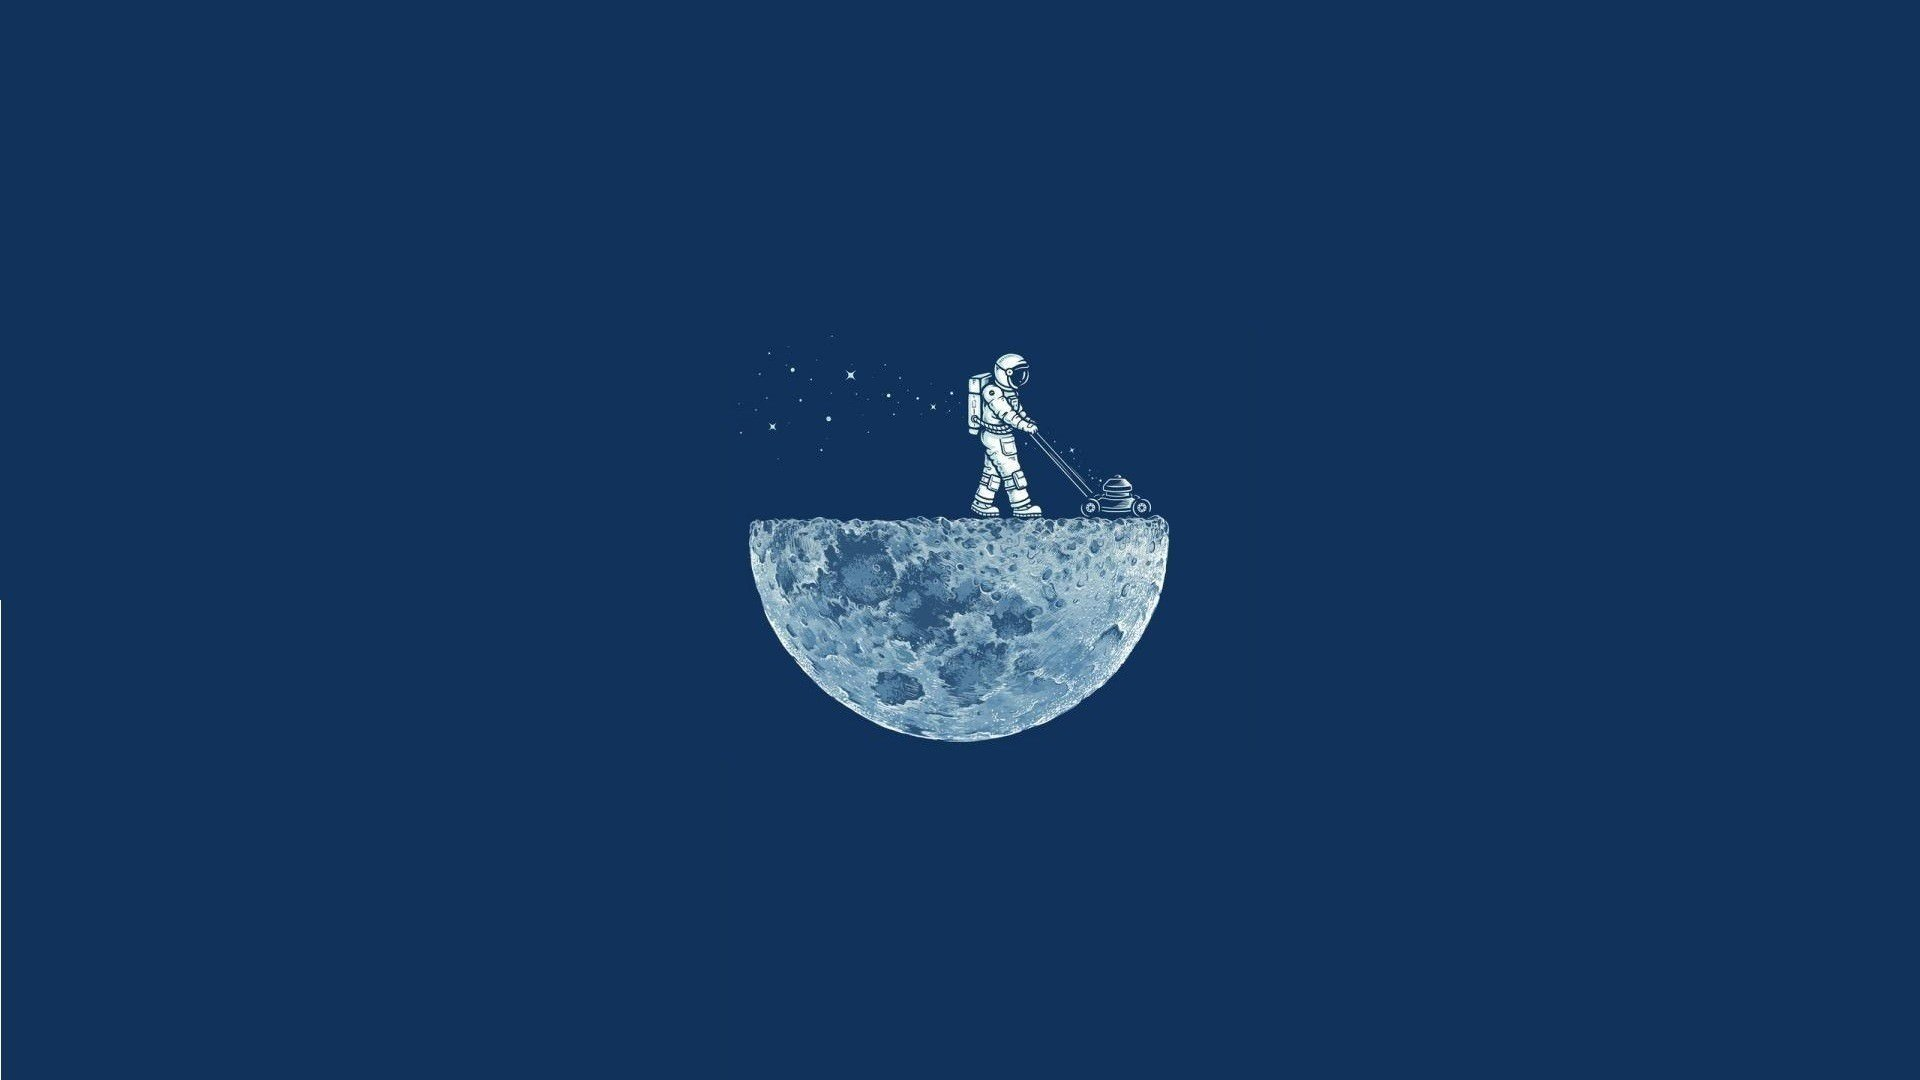 download DigitalArtio Moon Astronauts Illustration Wallpaper 1920x1080